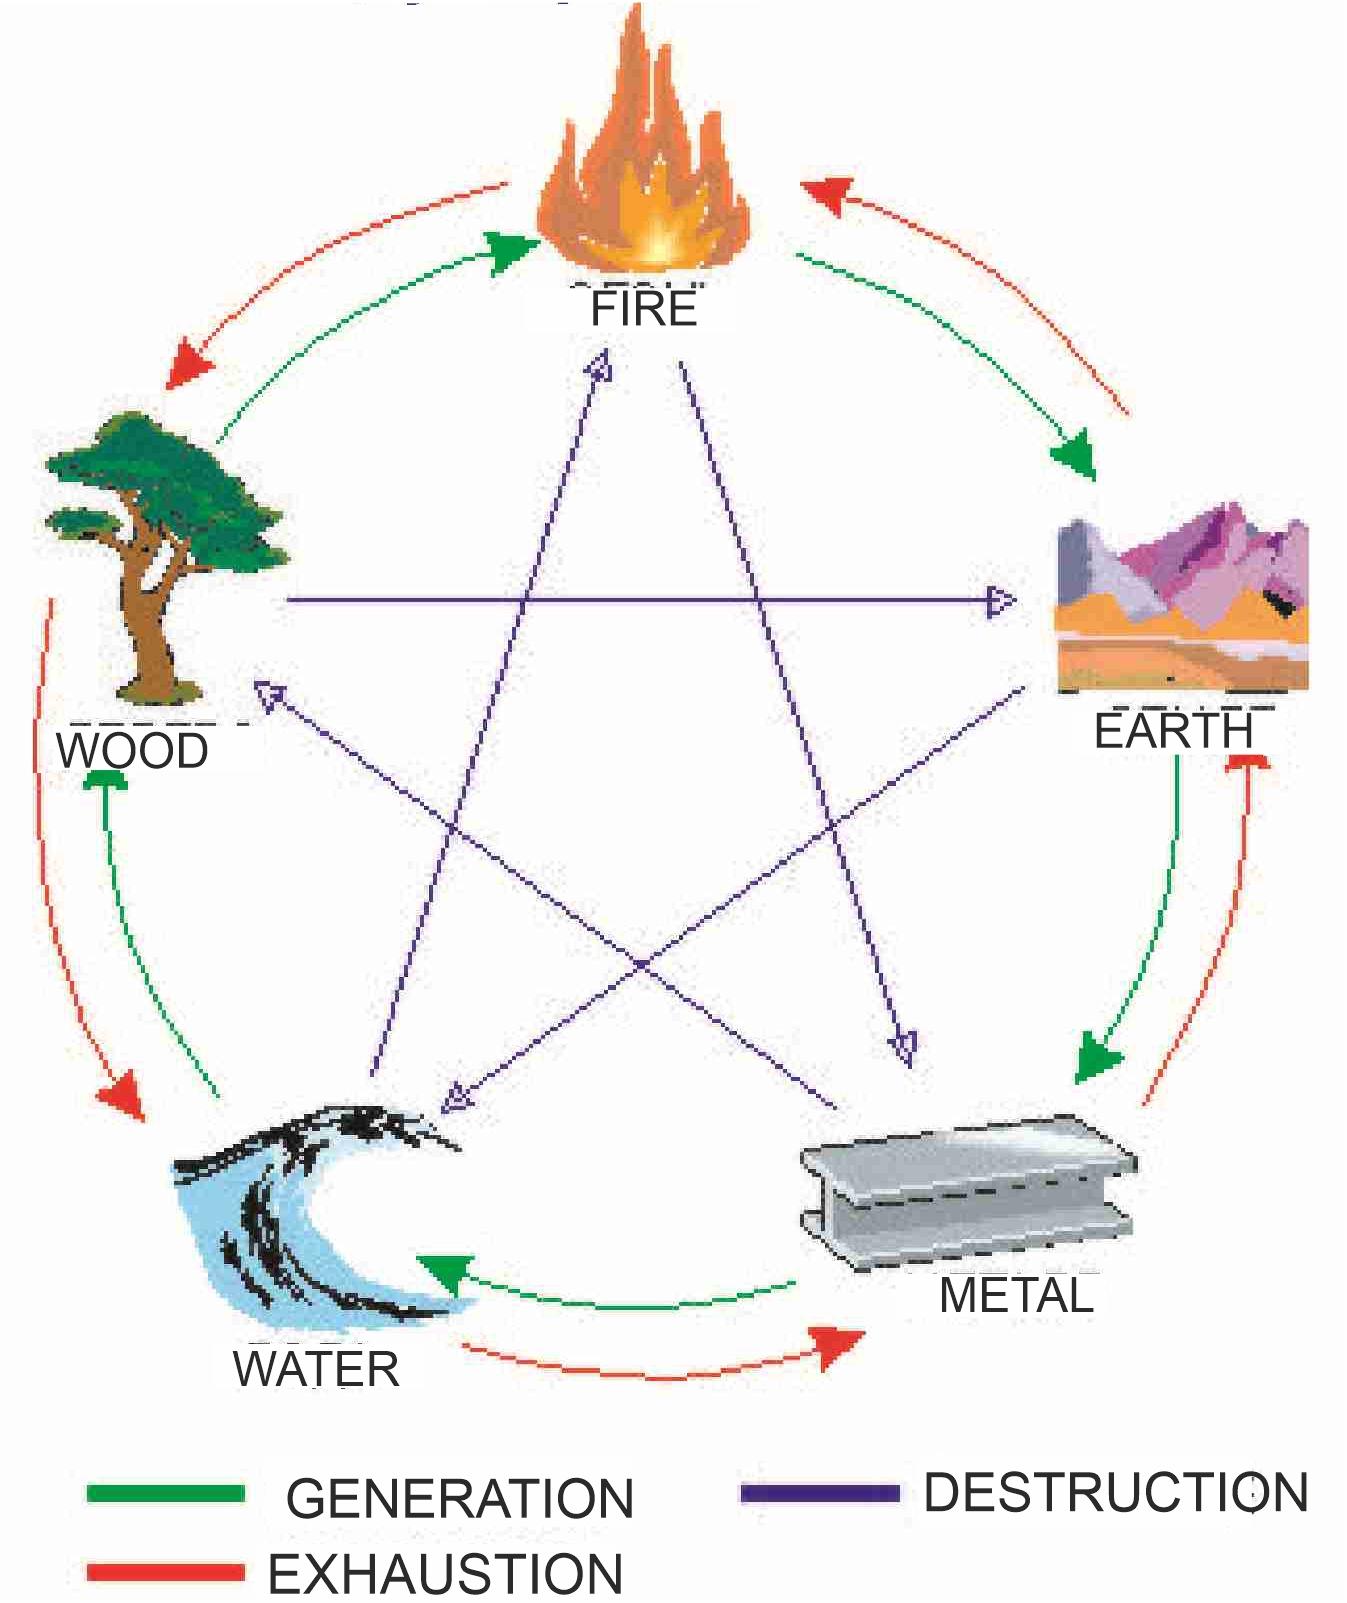 RELATIONSHIP DESTRUCTION, GENERATION,EXHAUSTION BETWEEN PRIMARY ELEMENTS